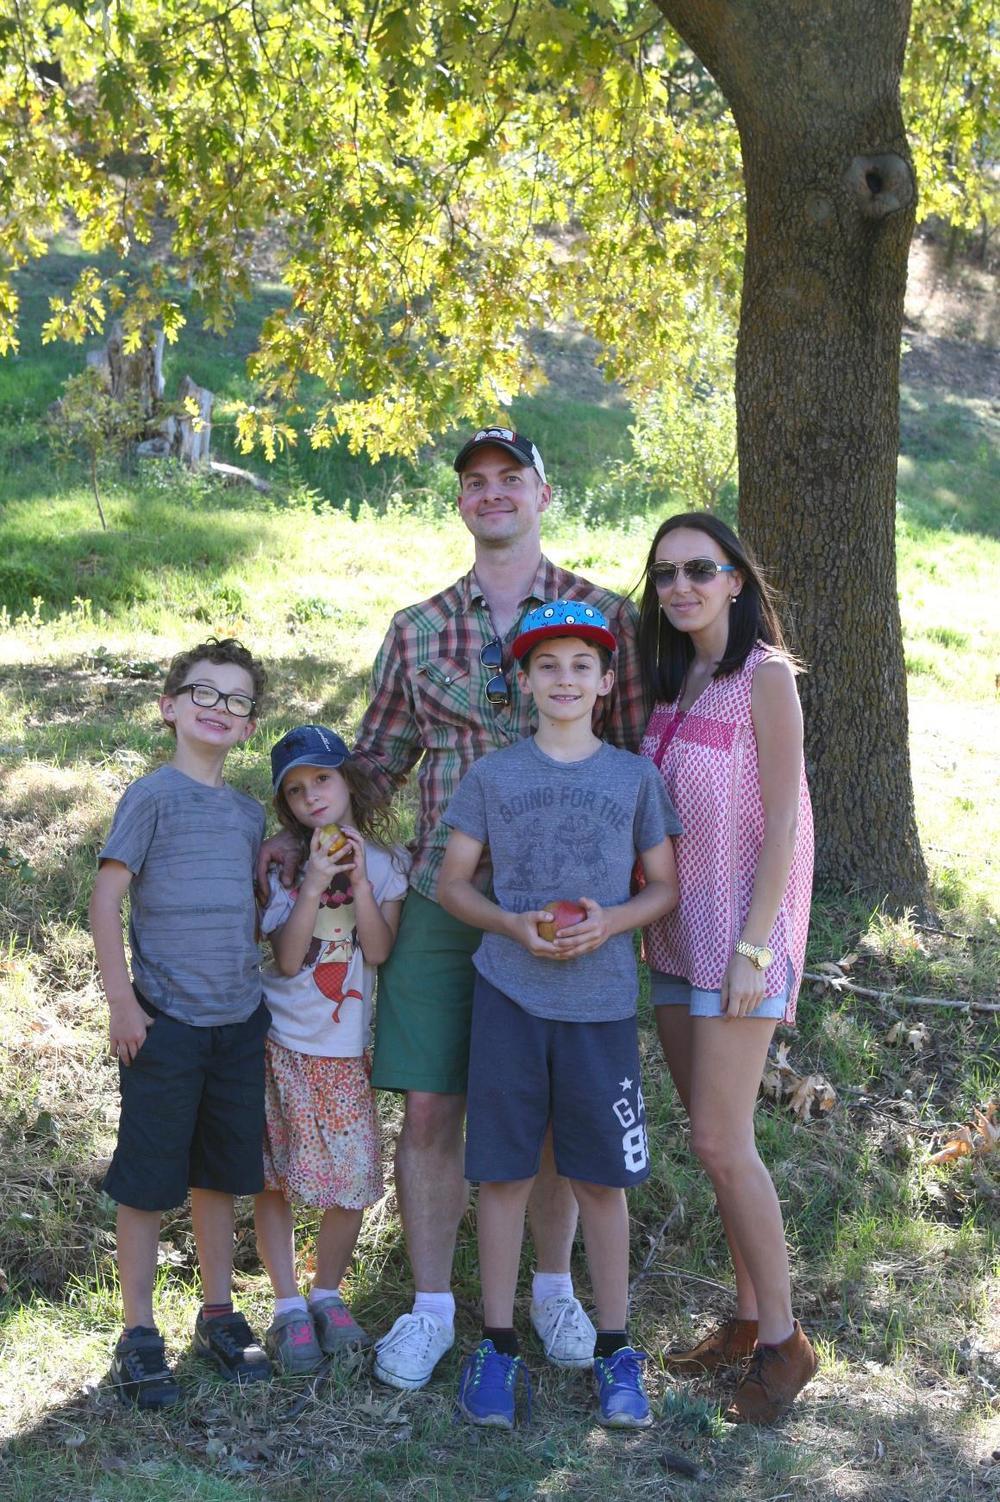 rileys farm apples family.jpg